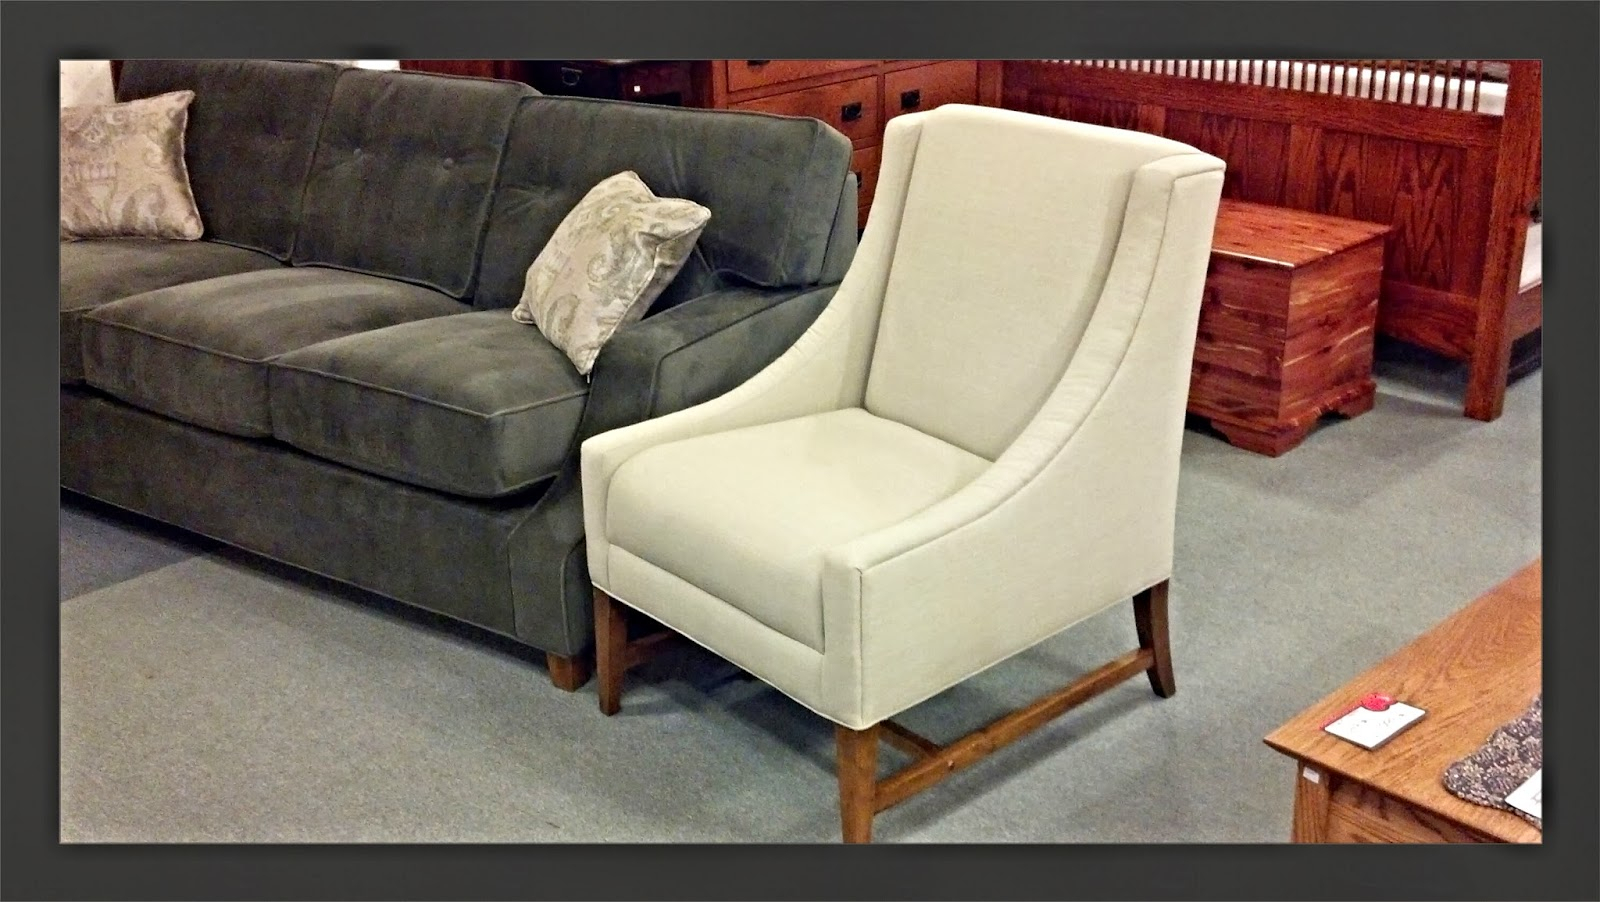 Binghamton Furniture: Parker Sofa & Ivy Chairnorwalk Furniture Inside Parker Sofa Chairs (View 11 of 25)